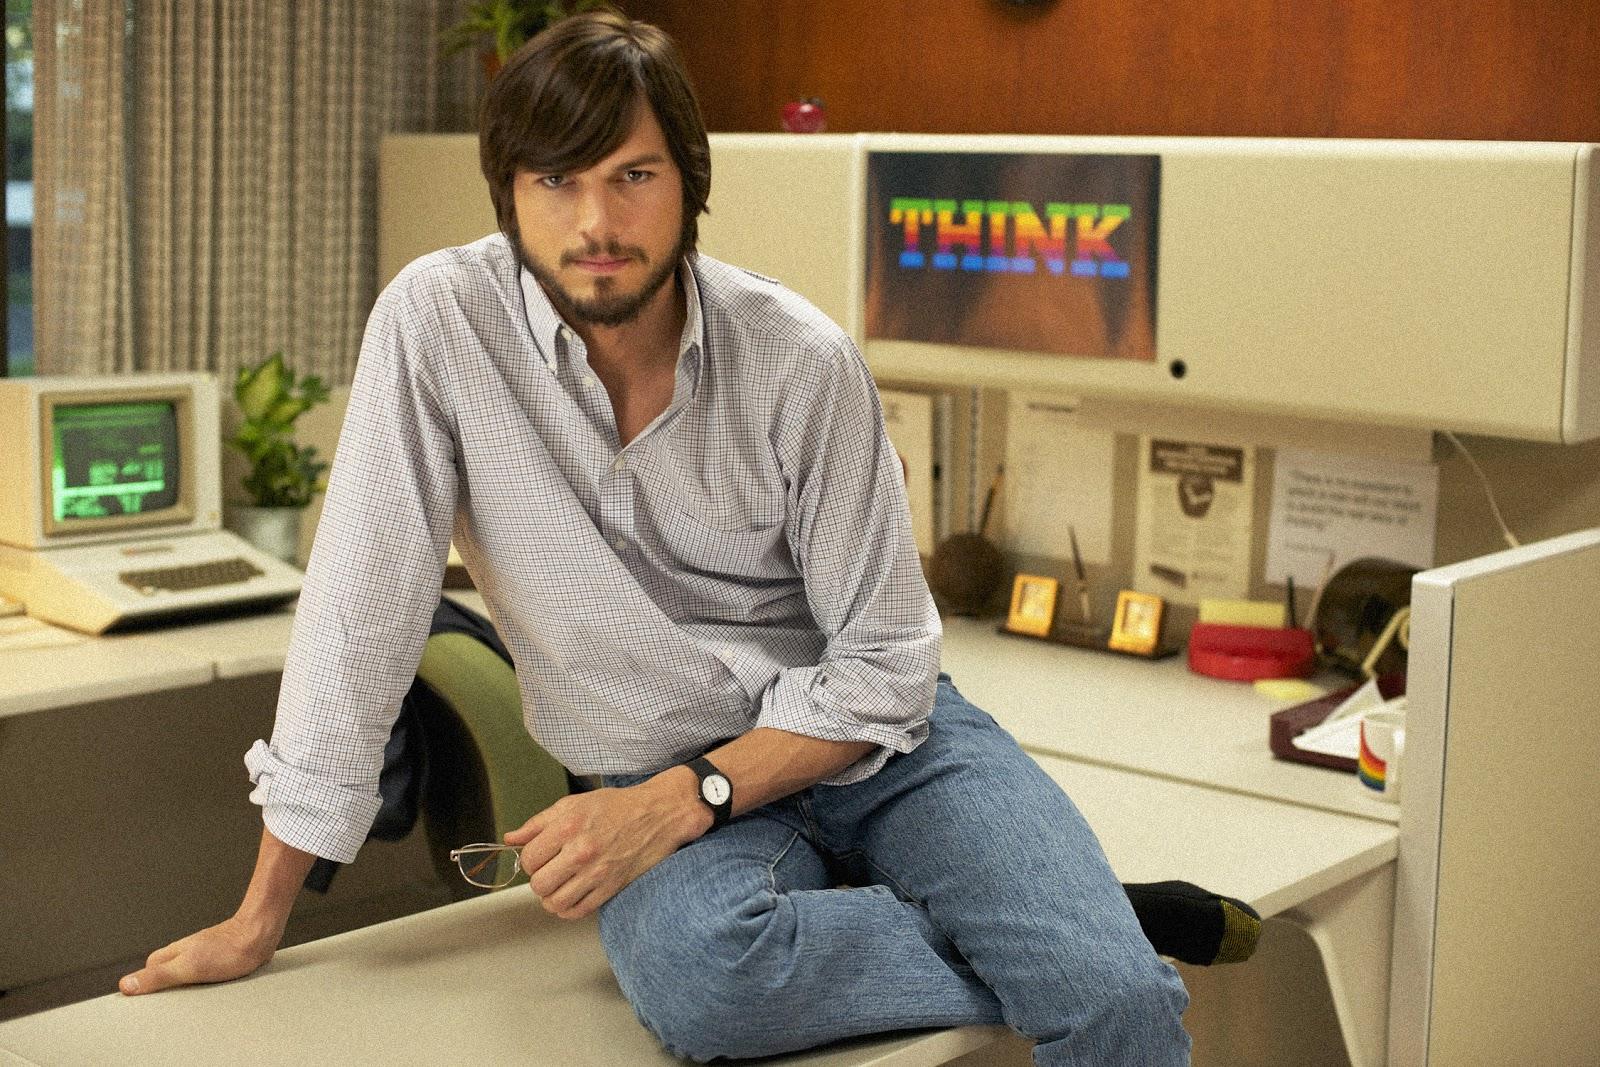 http://2.bp.blogspot.com/-6CPS_GHYMyU/UL2FbxtV5uI/AAAAAAAAQSY/4ub-QNry5A4/s1600/Ashton-Kutcher-JOBS.jpg